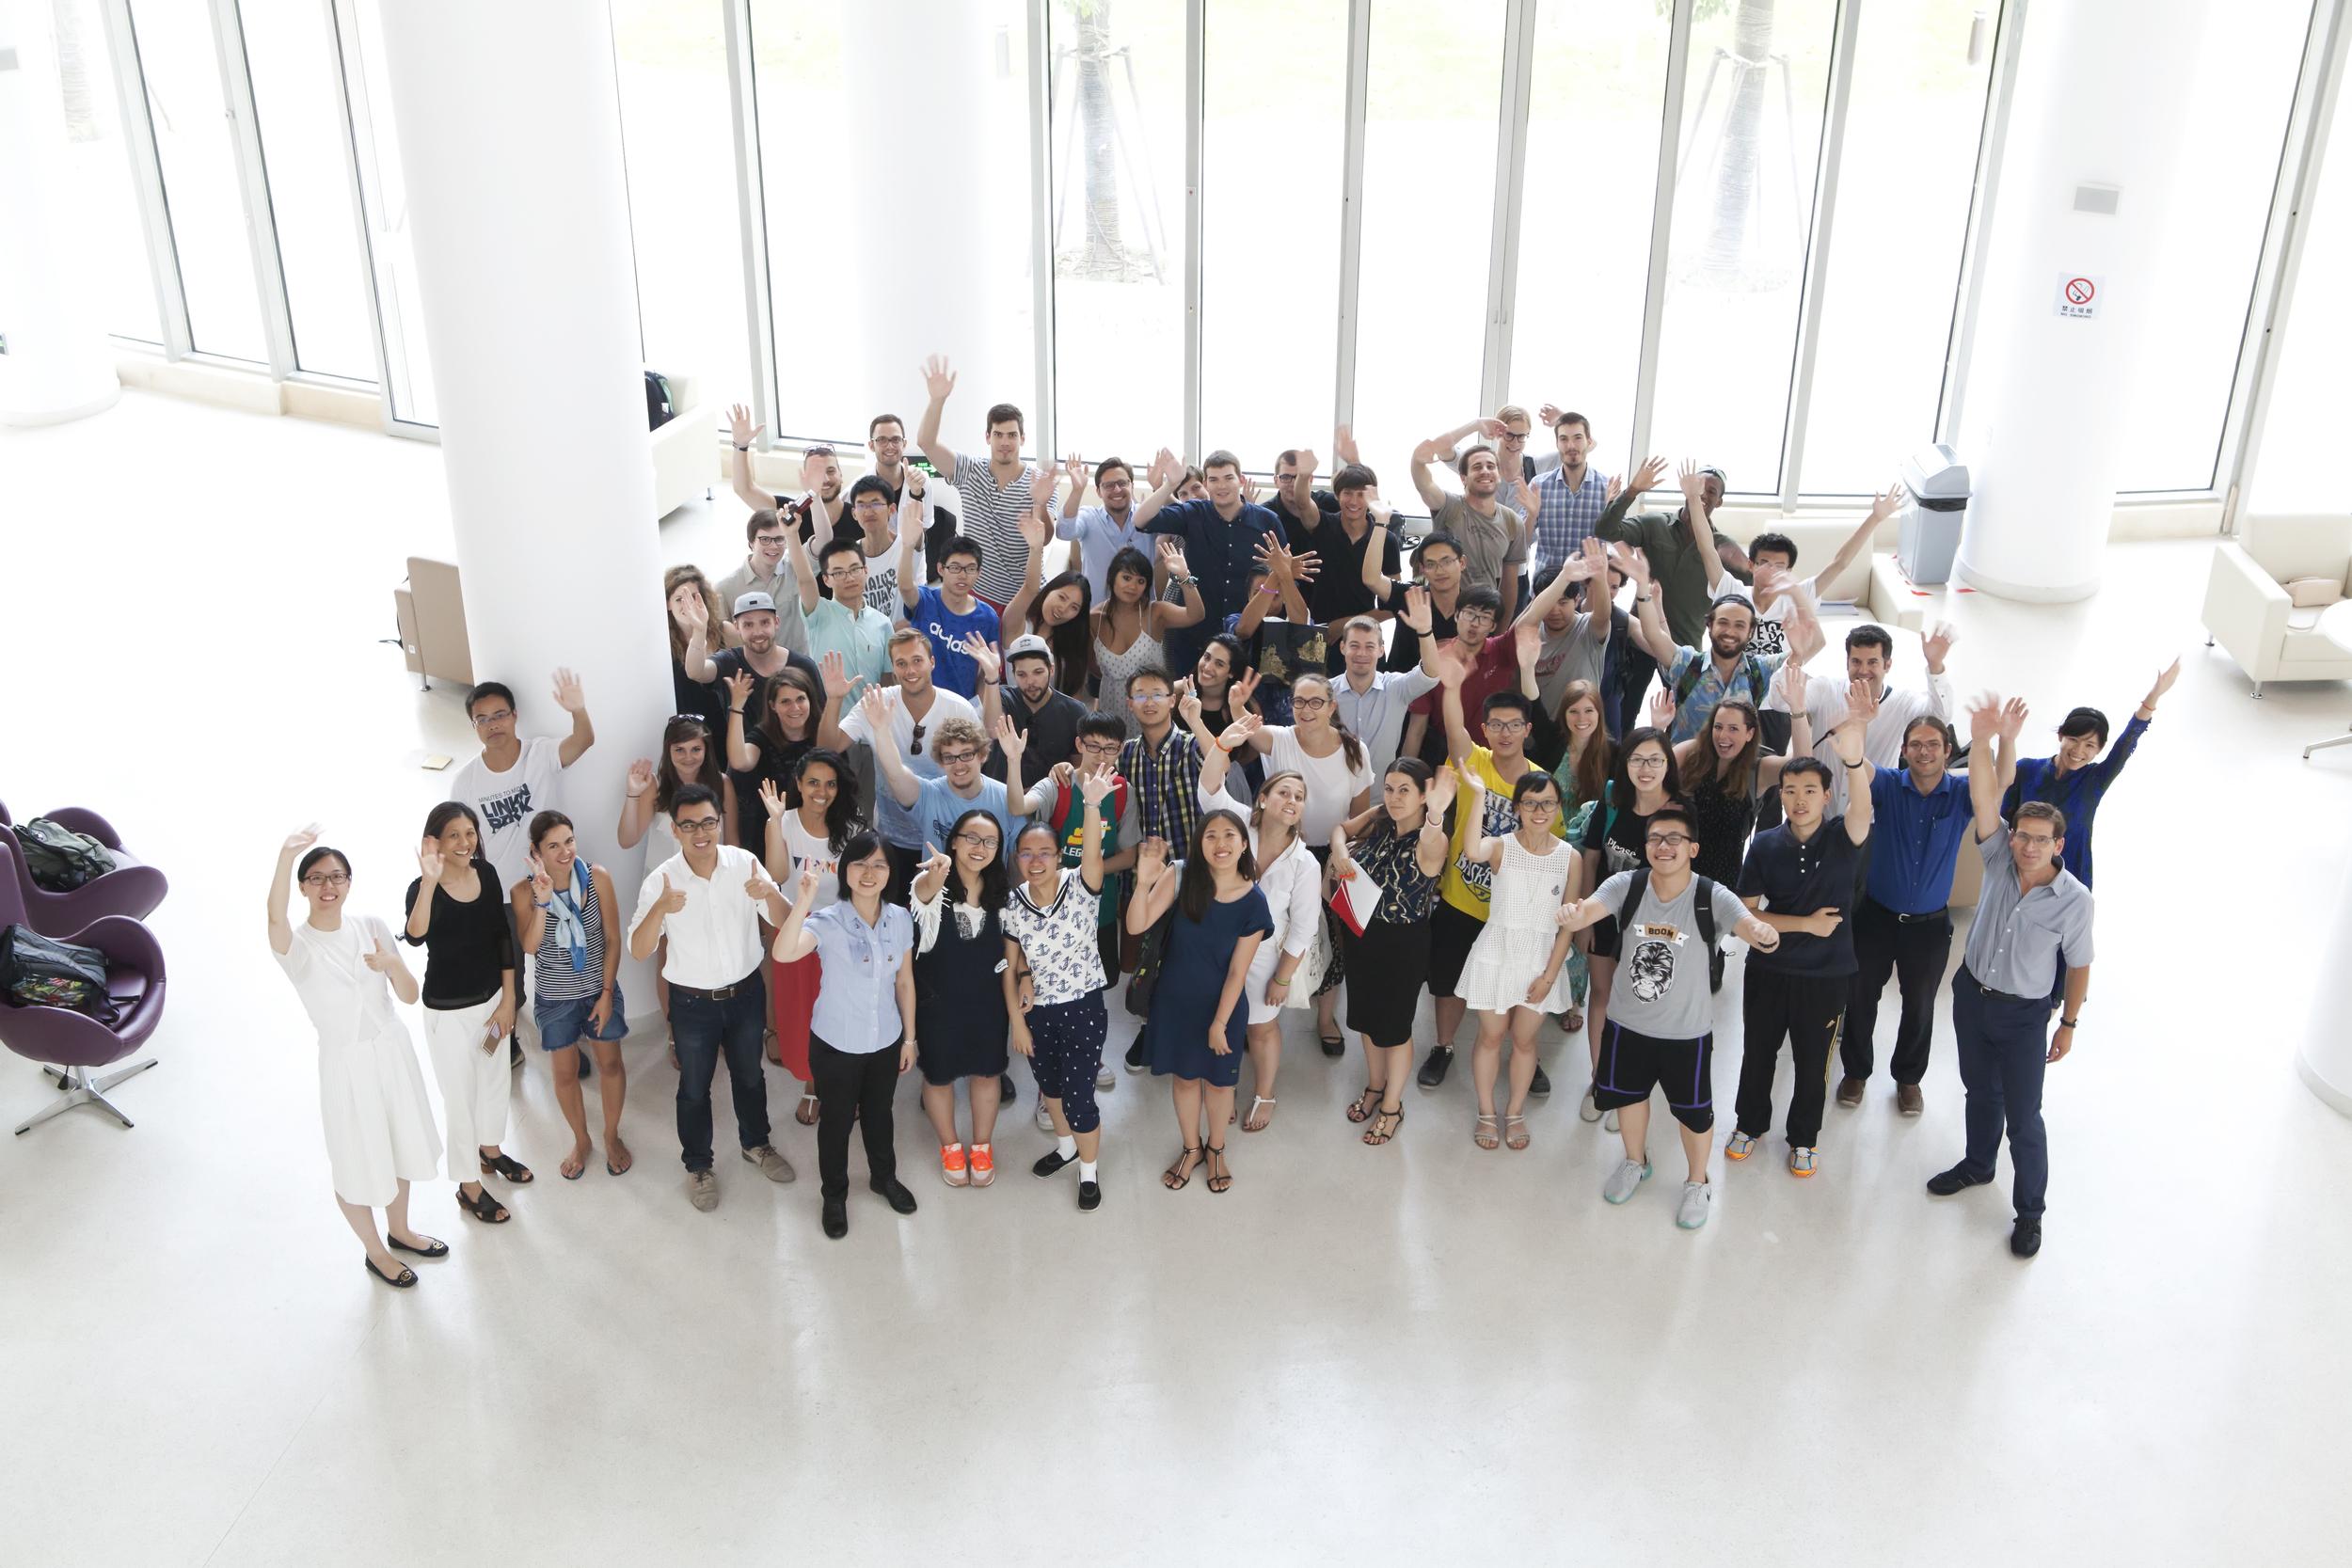 InnoKick_ShanghaiTech Group Photo.jpg